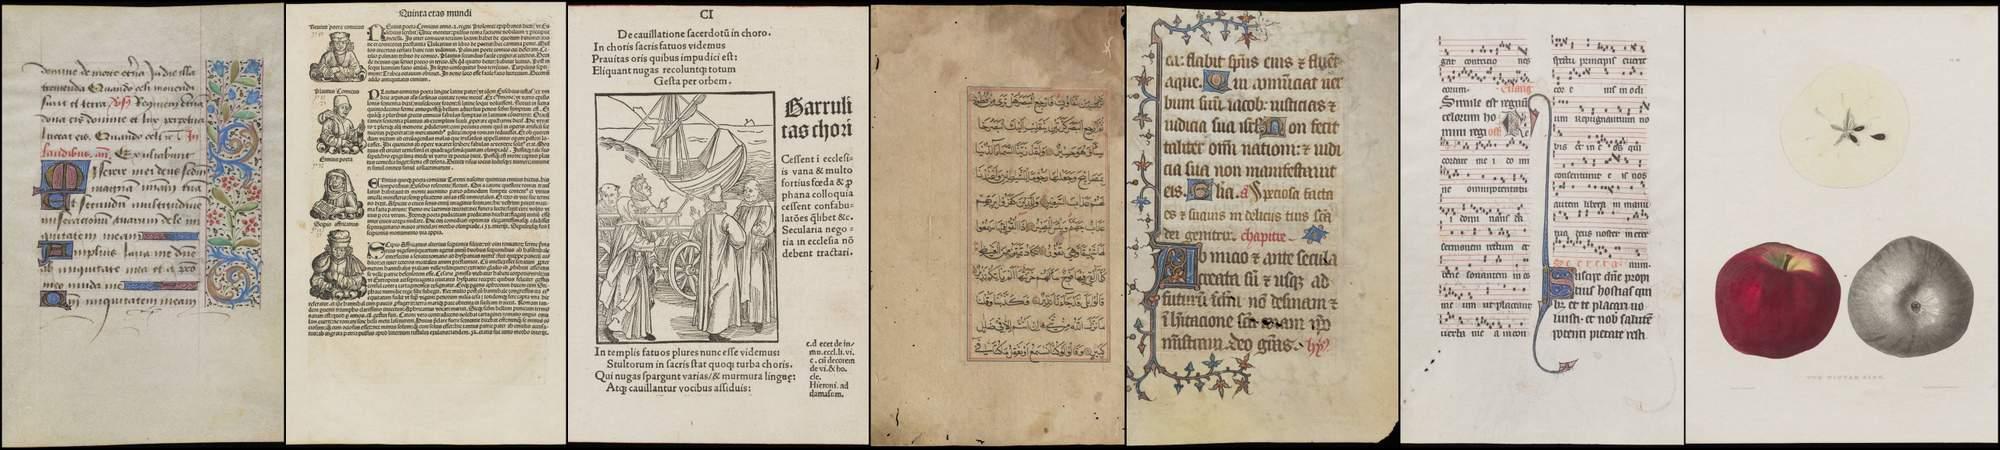 Manuscript and Printed Leaves | Ohio University